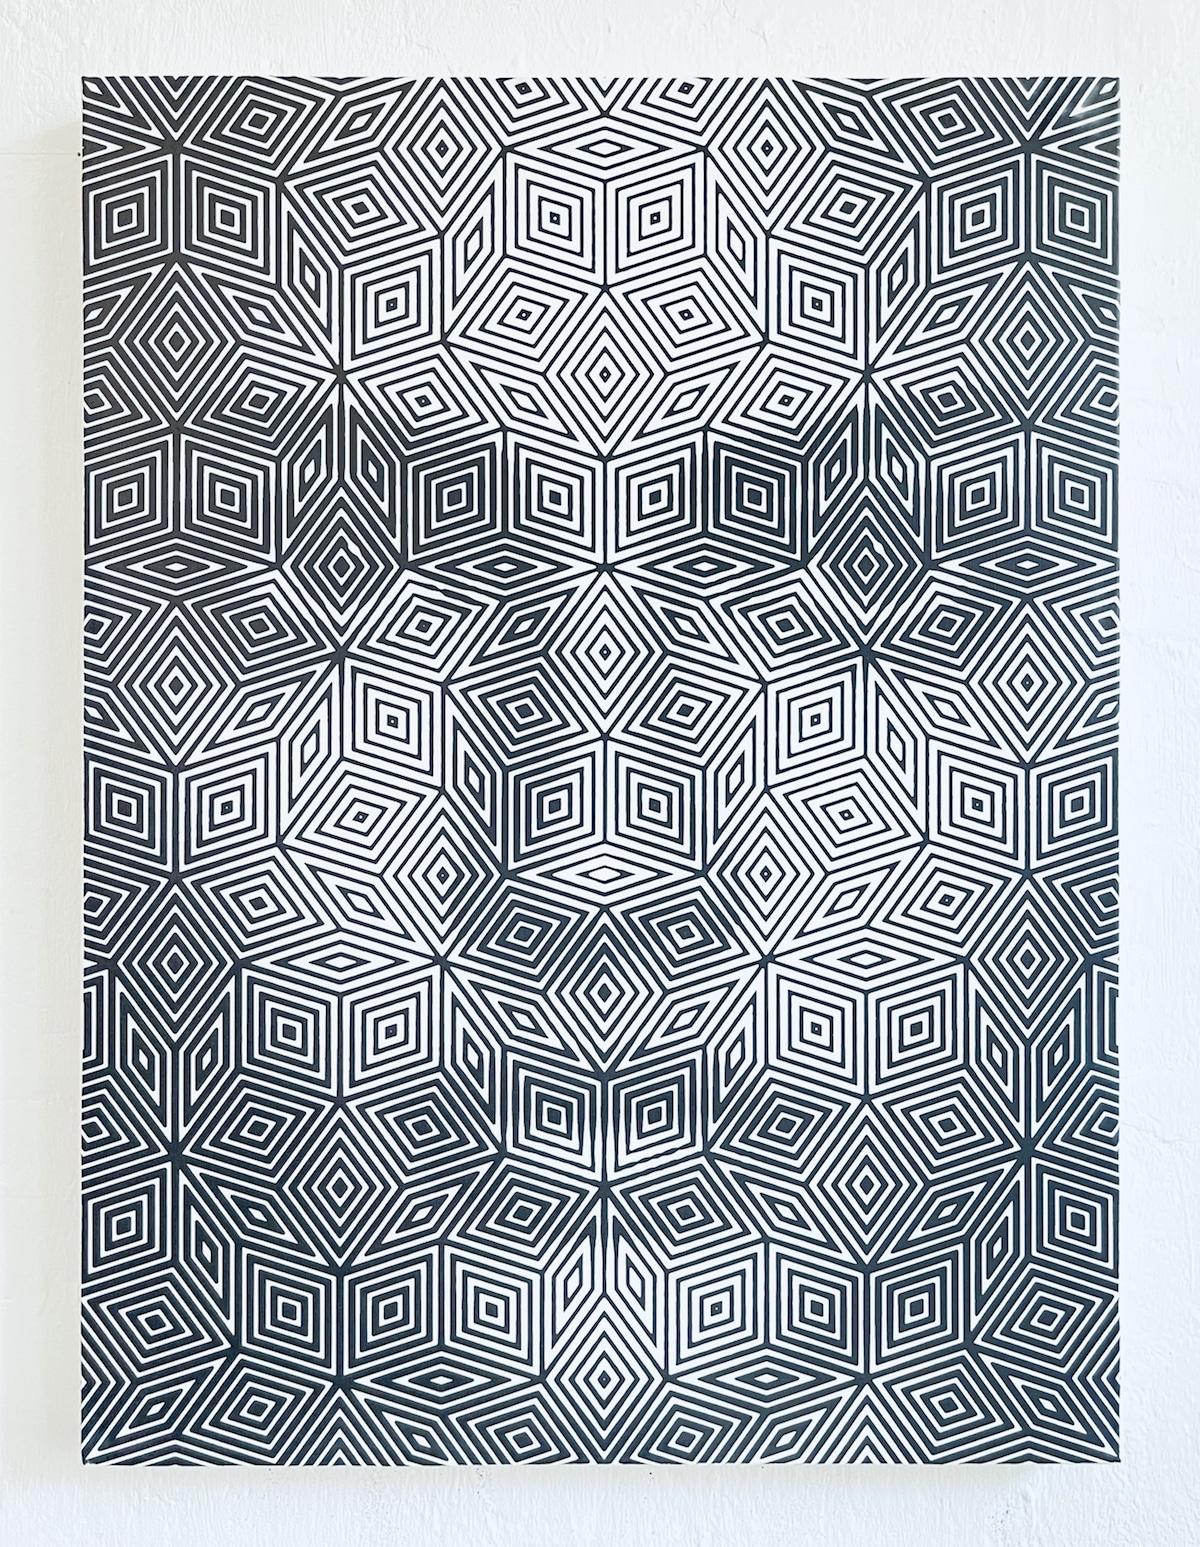 Geometric Pattern Portraits by Lee Wagstaff